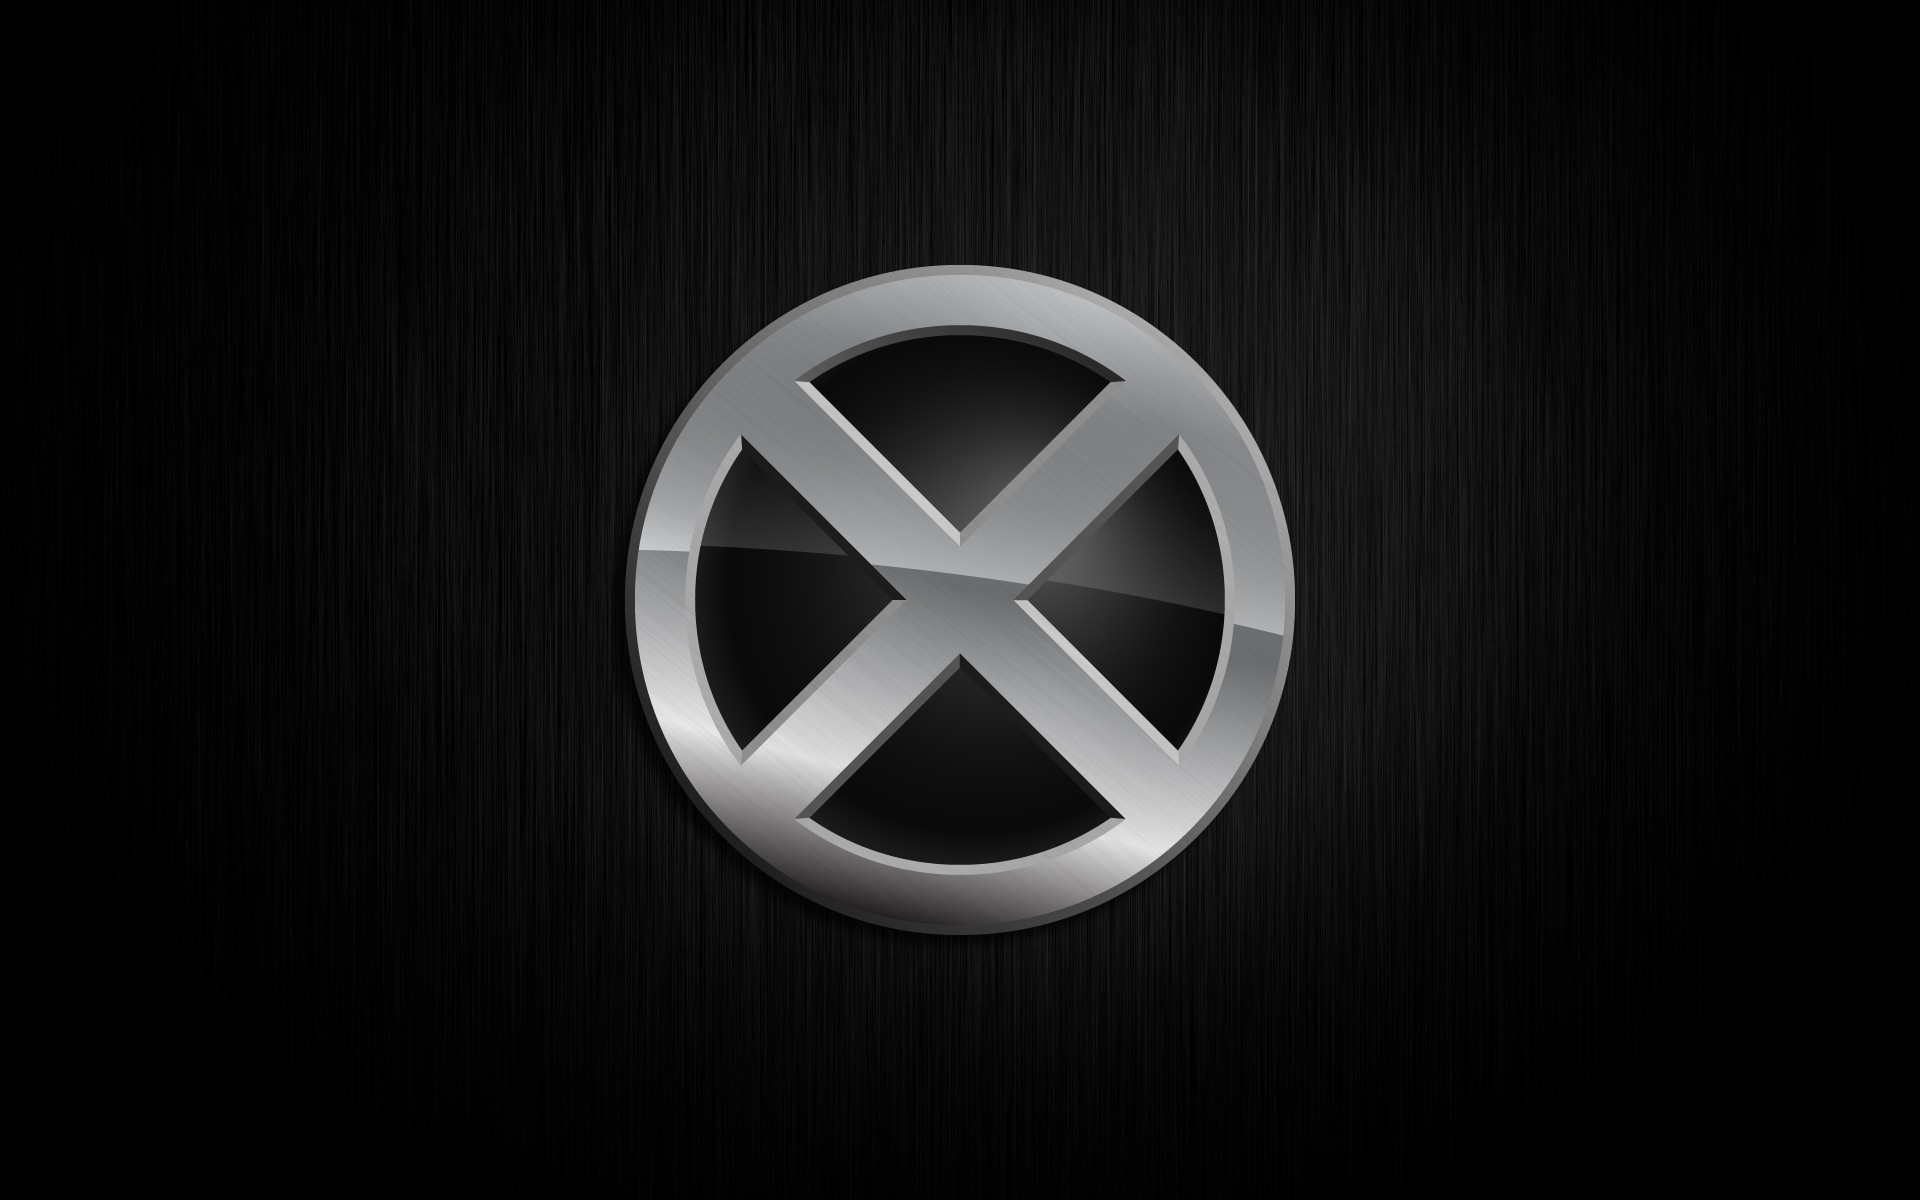 X Men Logos Hd Wallpaper View Resize And Free Download Wallpaperjam Com